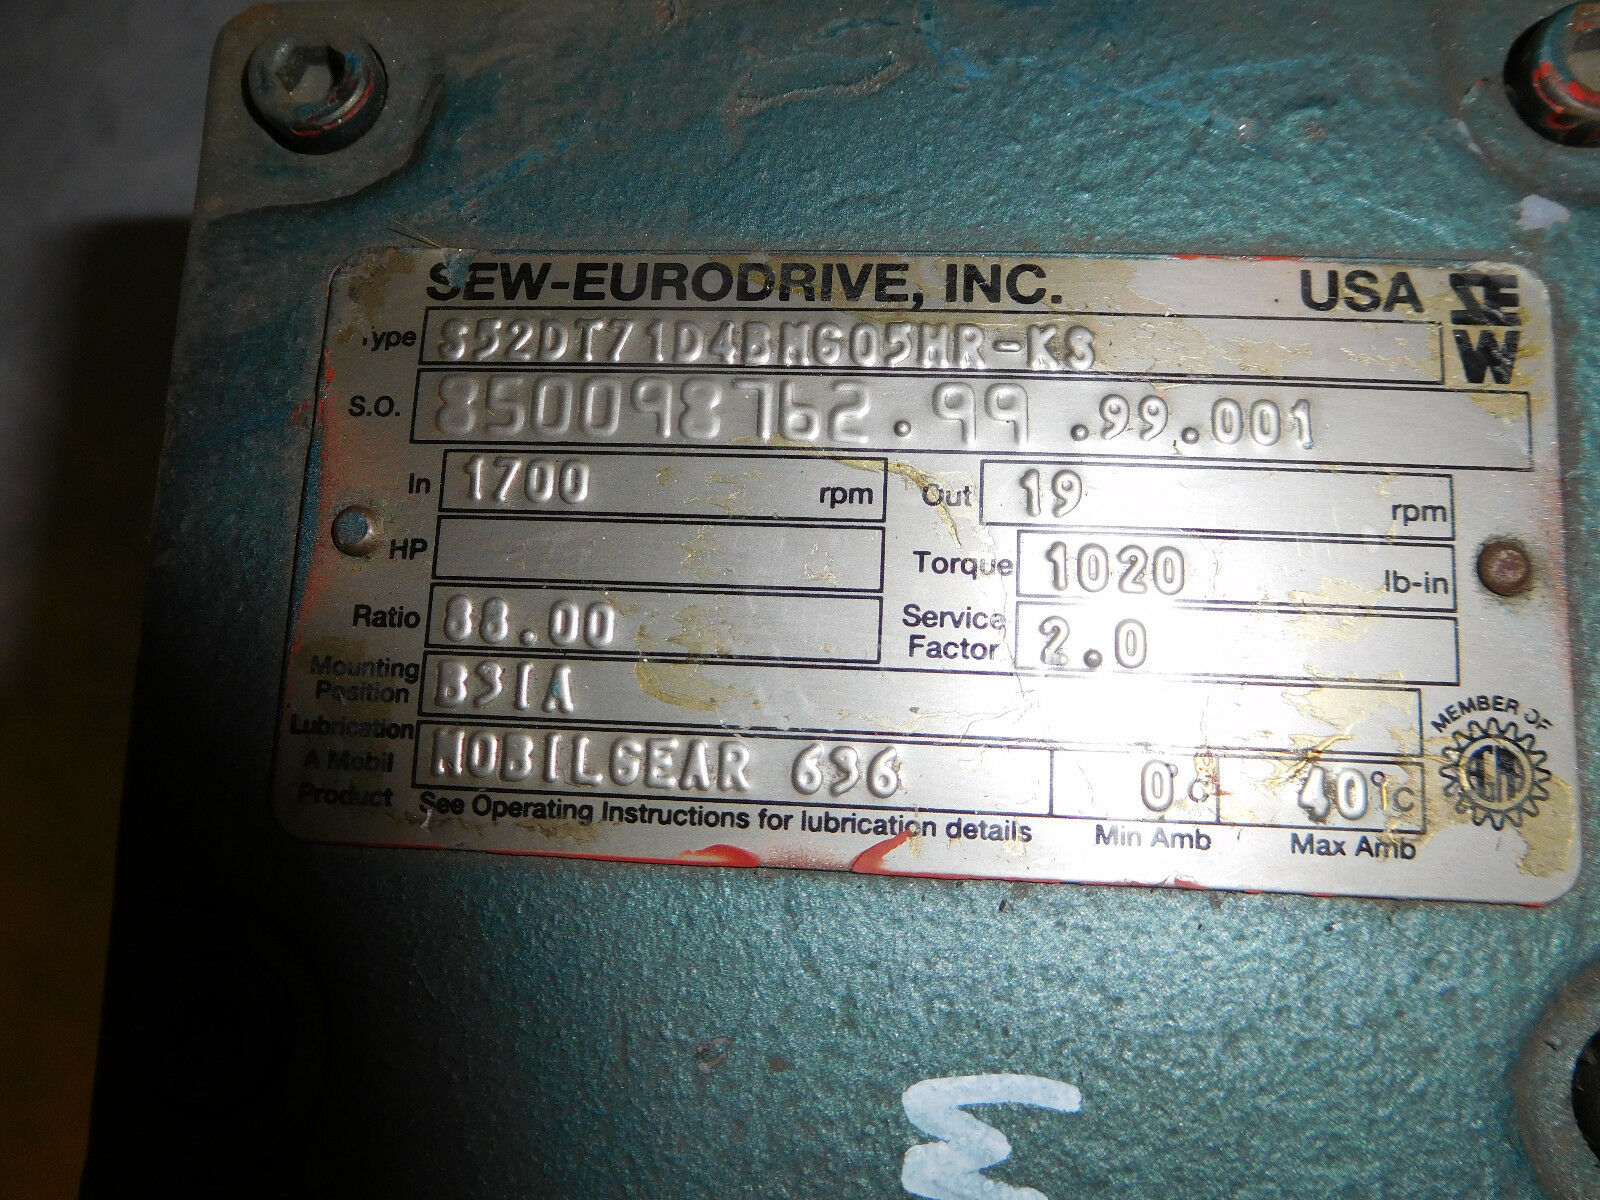 Sew Eurodrive 1/2HP S52DT71D4BMG05HRK3/DFT71D4BMG05HR-K3 Gear Motor 1/2HP Eurodrive 88:1 ratio bbe3c5